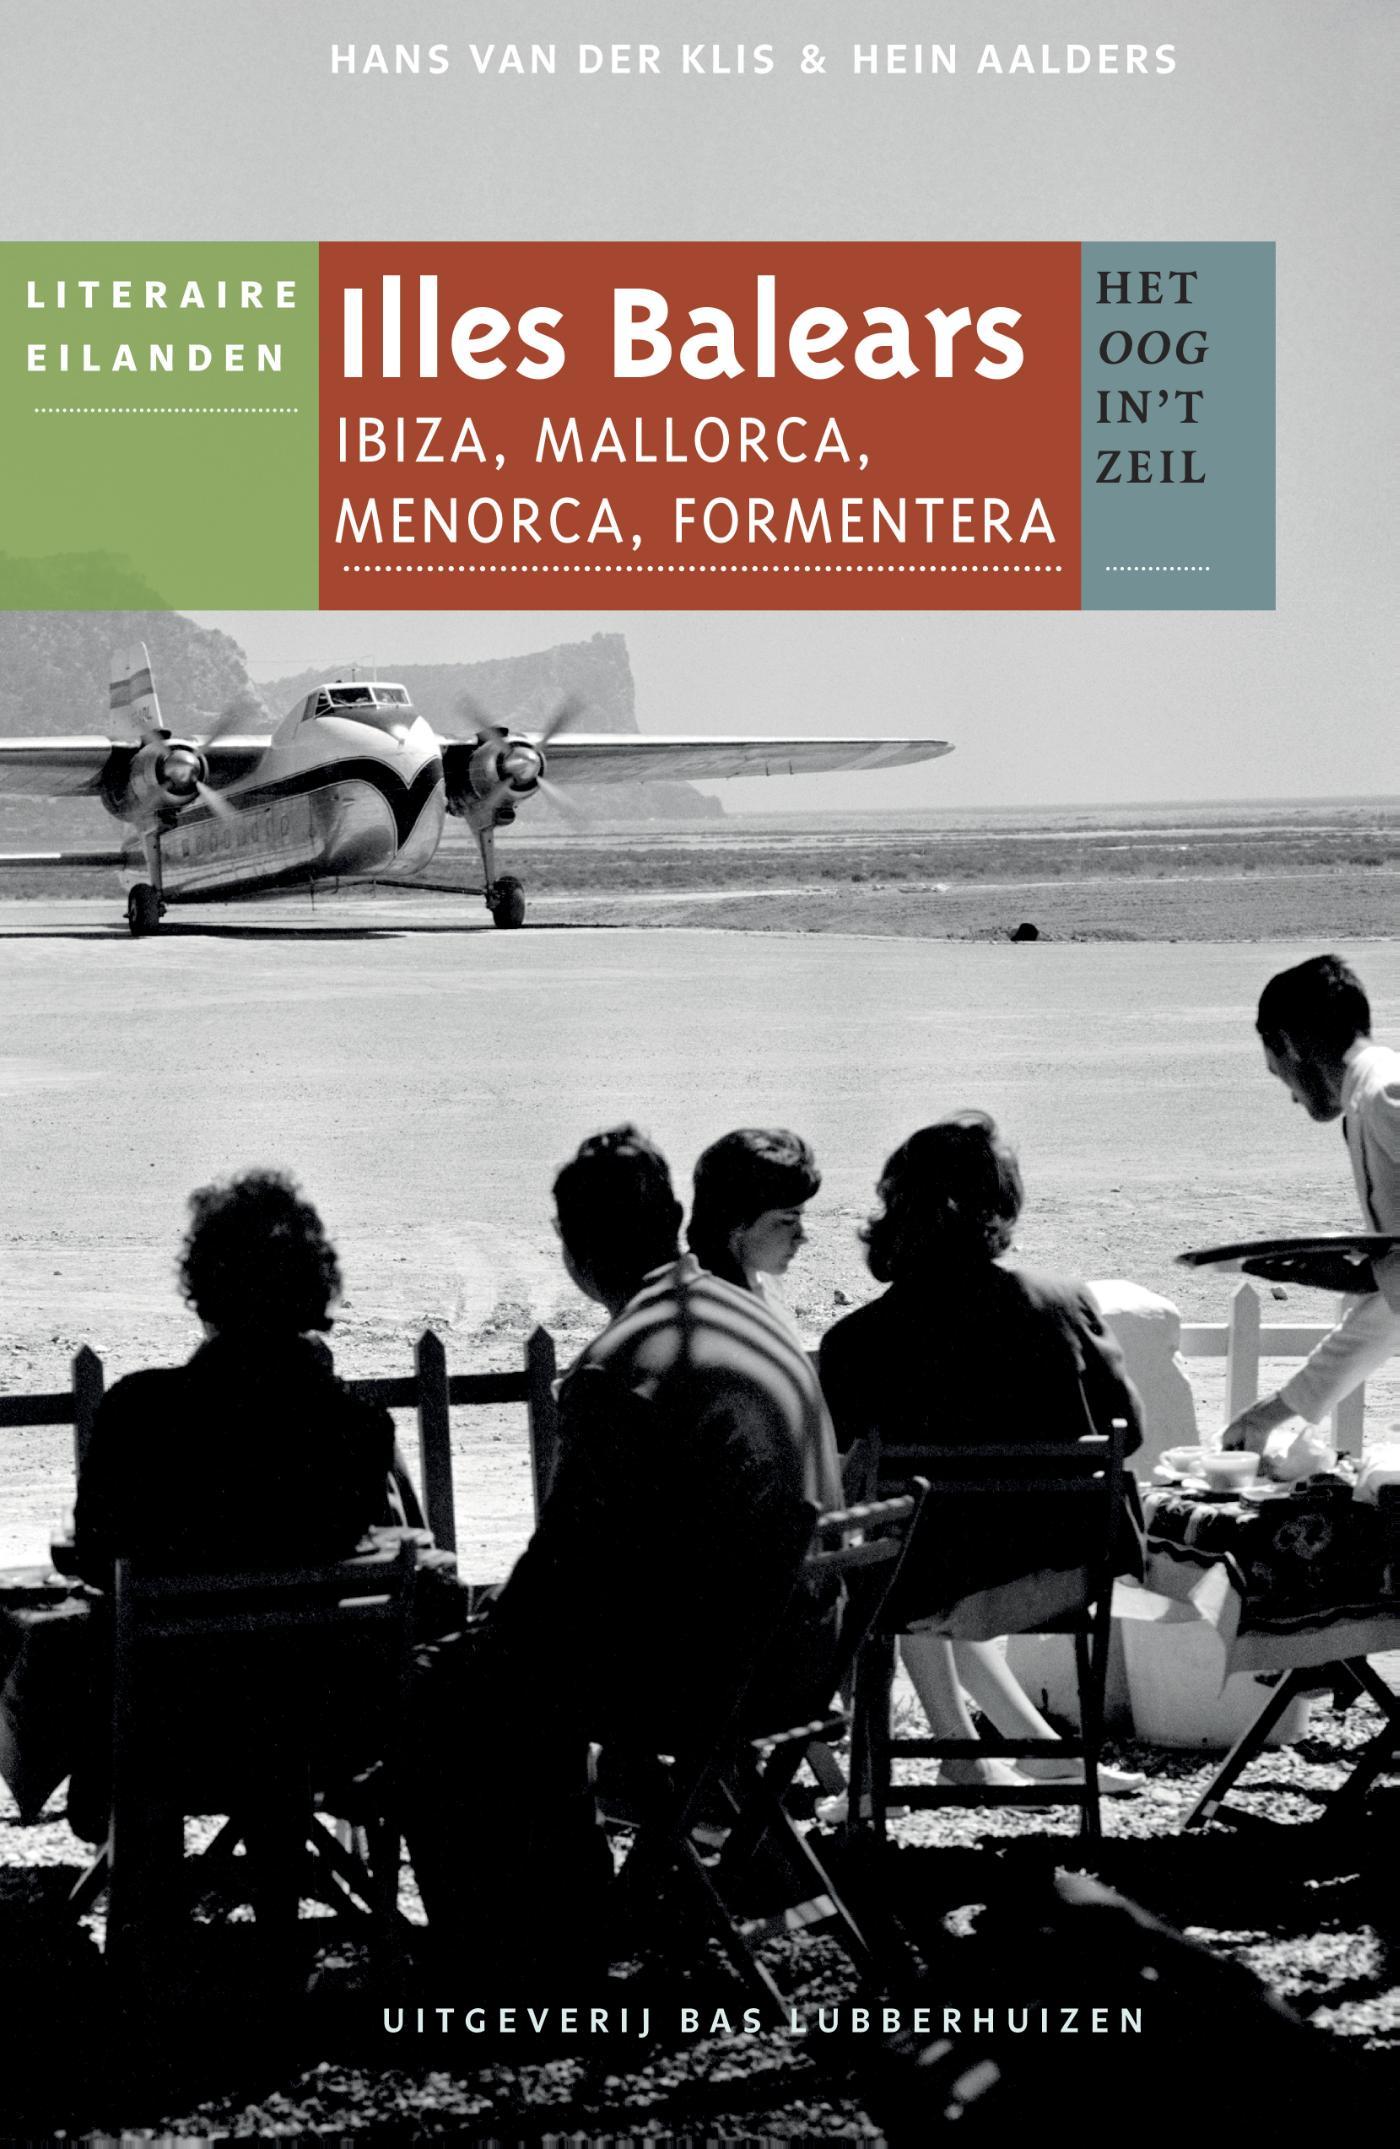 Illes Balears | Het oog in 't zeil 9789059374713  Bas Lubberhuizen Stedenreeks  Reisverhalen Balearen